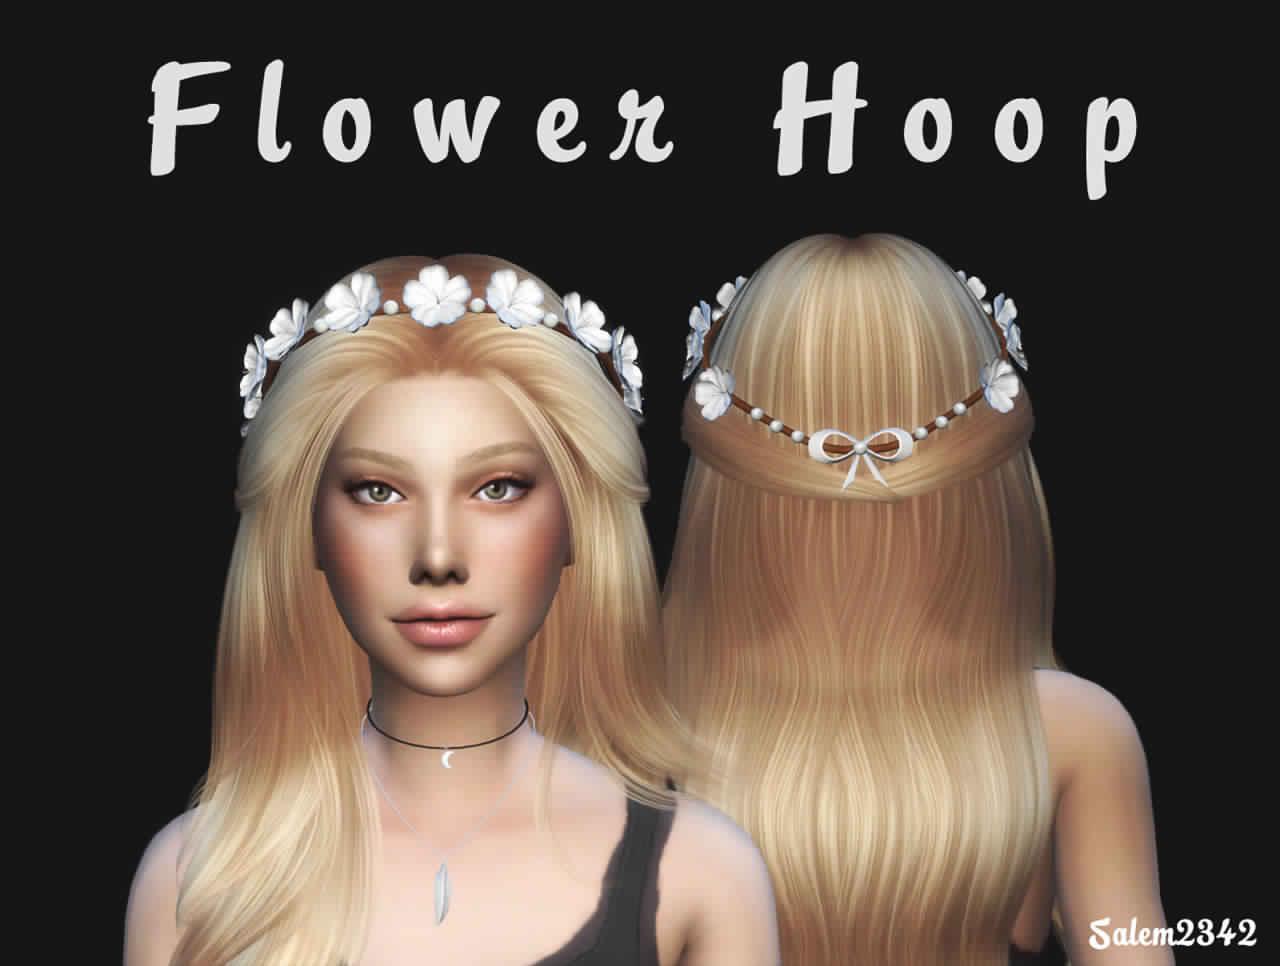 The sims 4 hair accessories - Flower Hoop By Salem2342